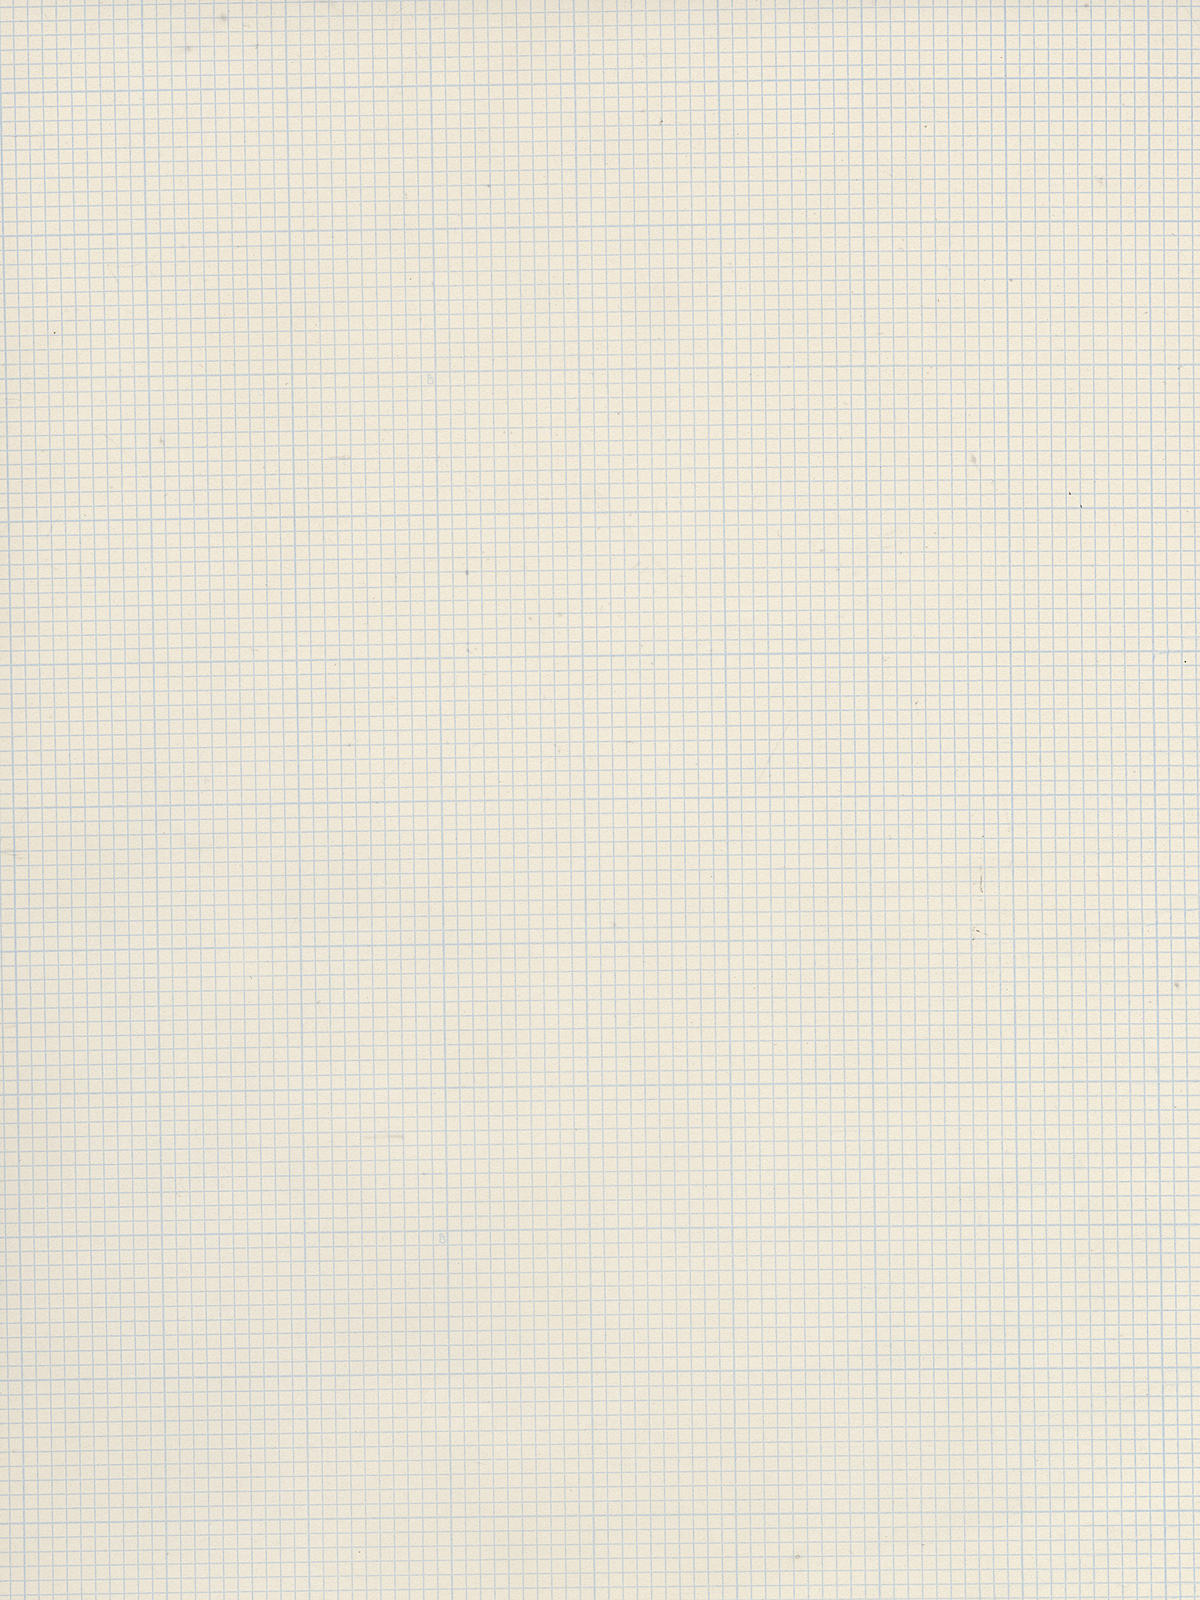 Clearprint Fade Out Design And Sketch Vellum Grid Misterartcom